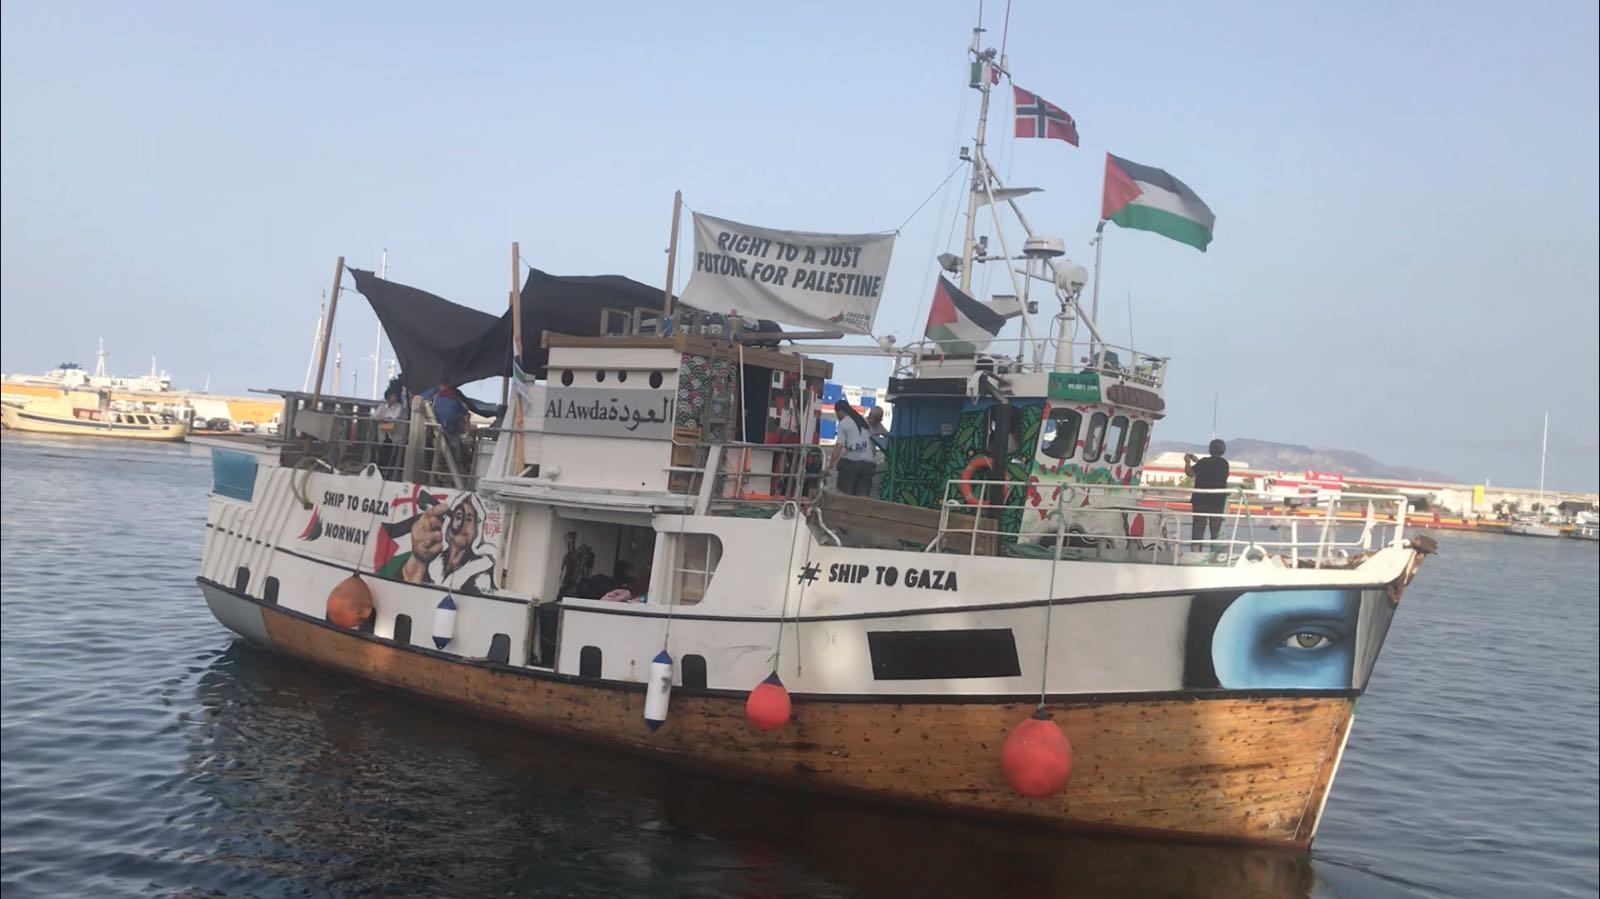 The Al Awda was hijacked in international waters